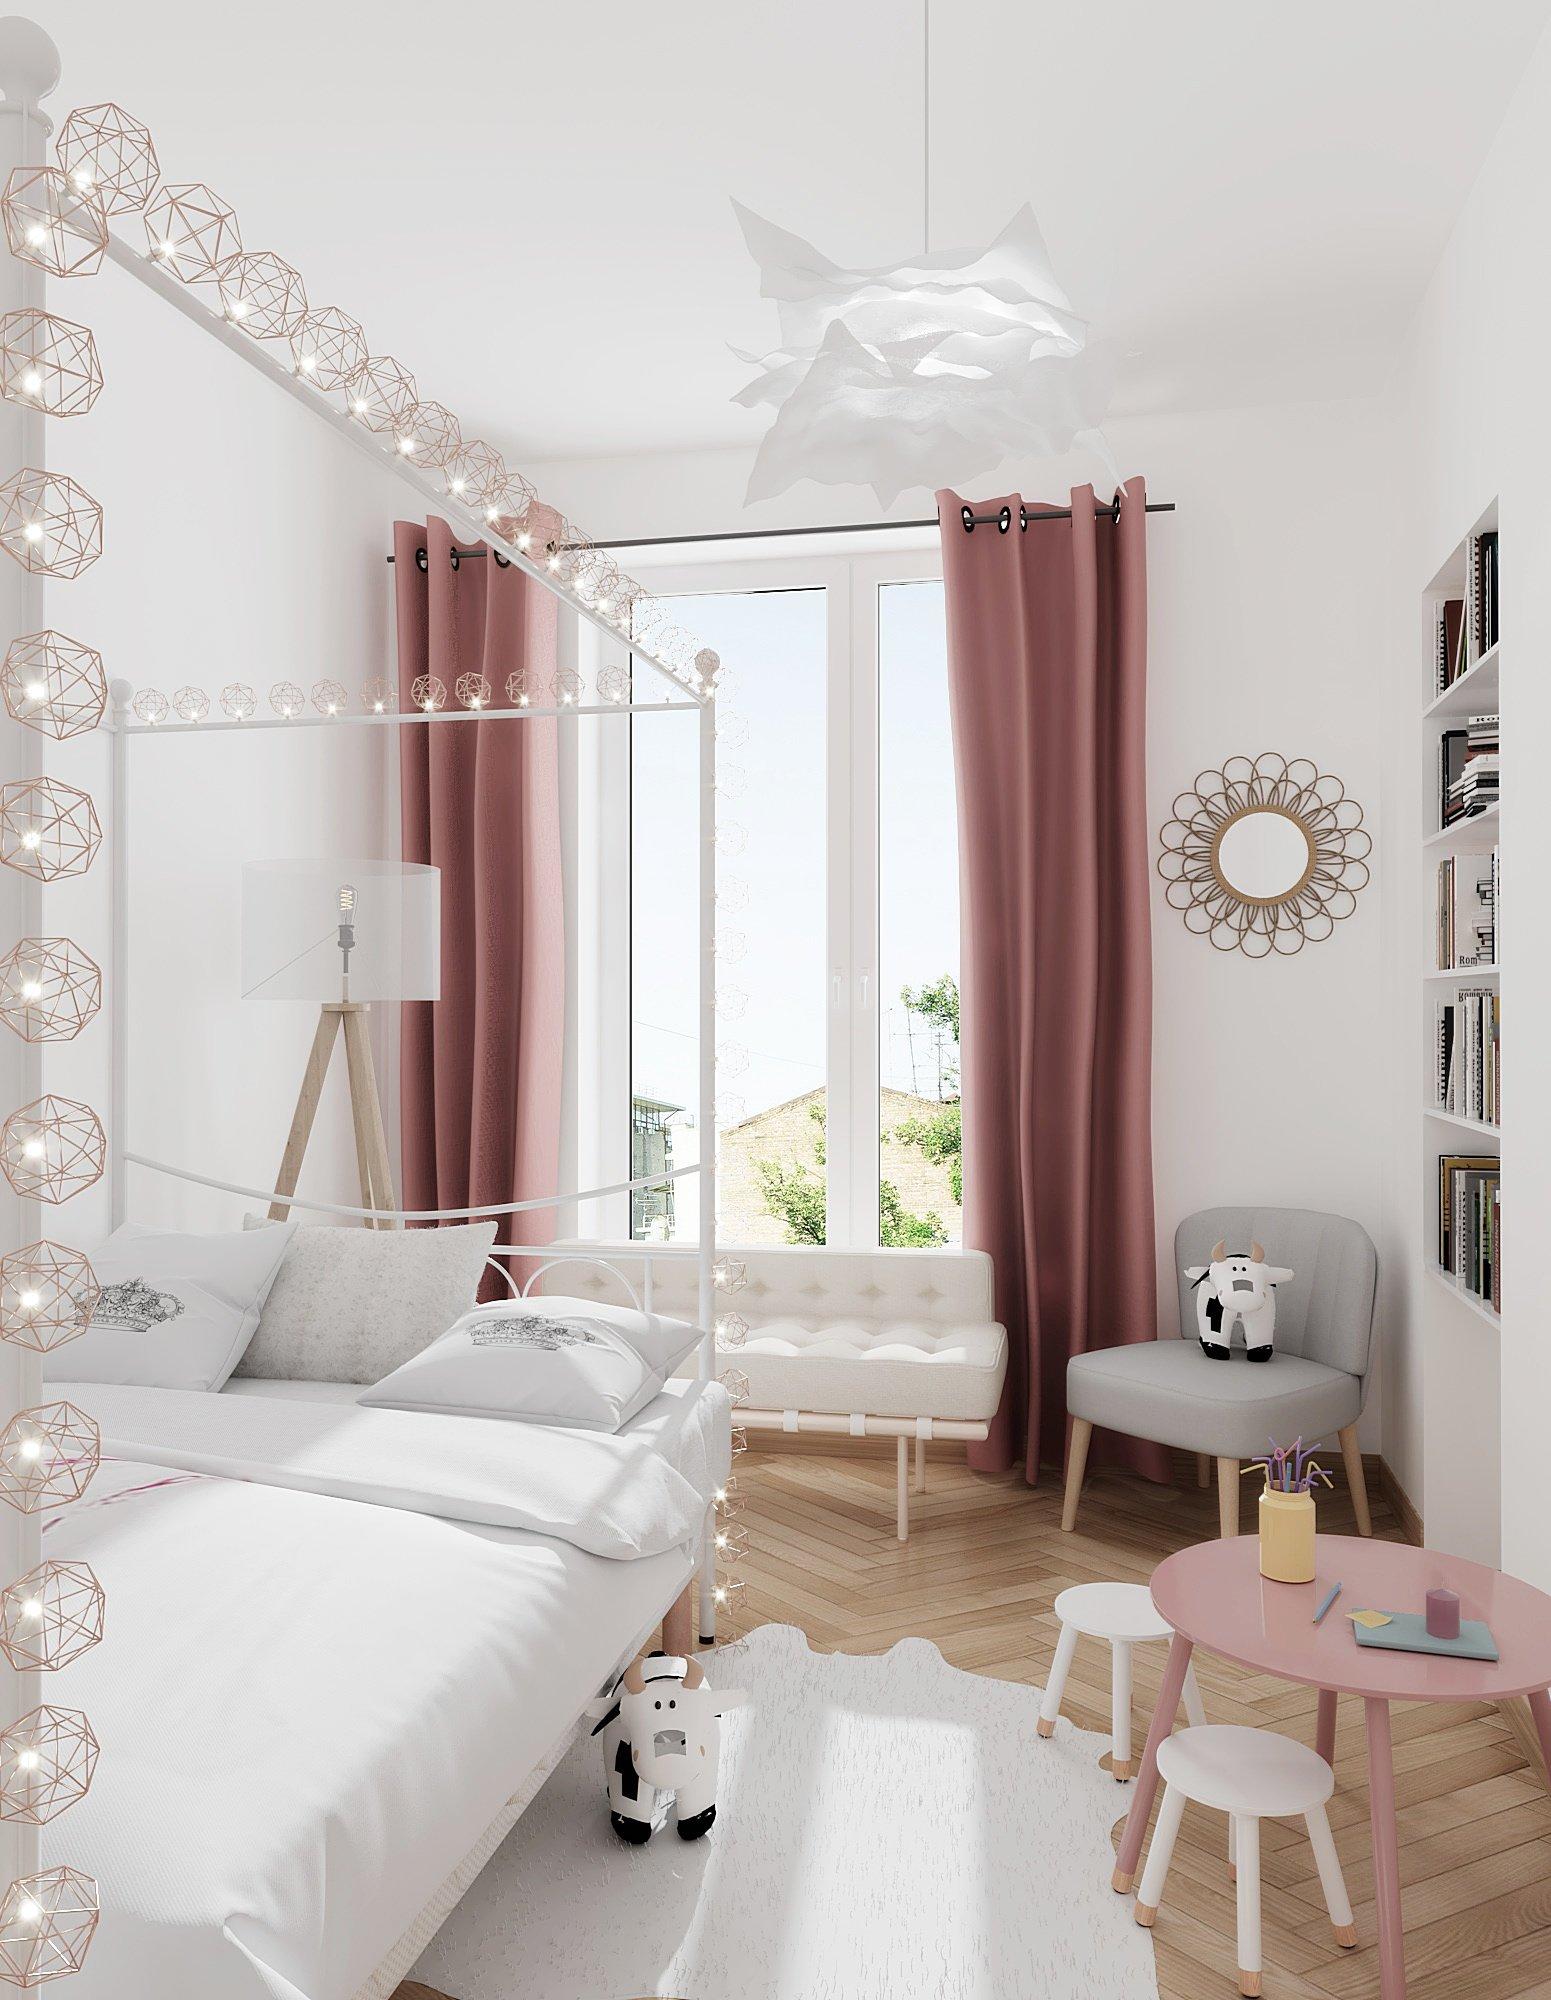 Chambre d\'enfant scandinave blanche rose : inspiration style Scandinave